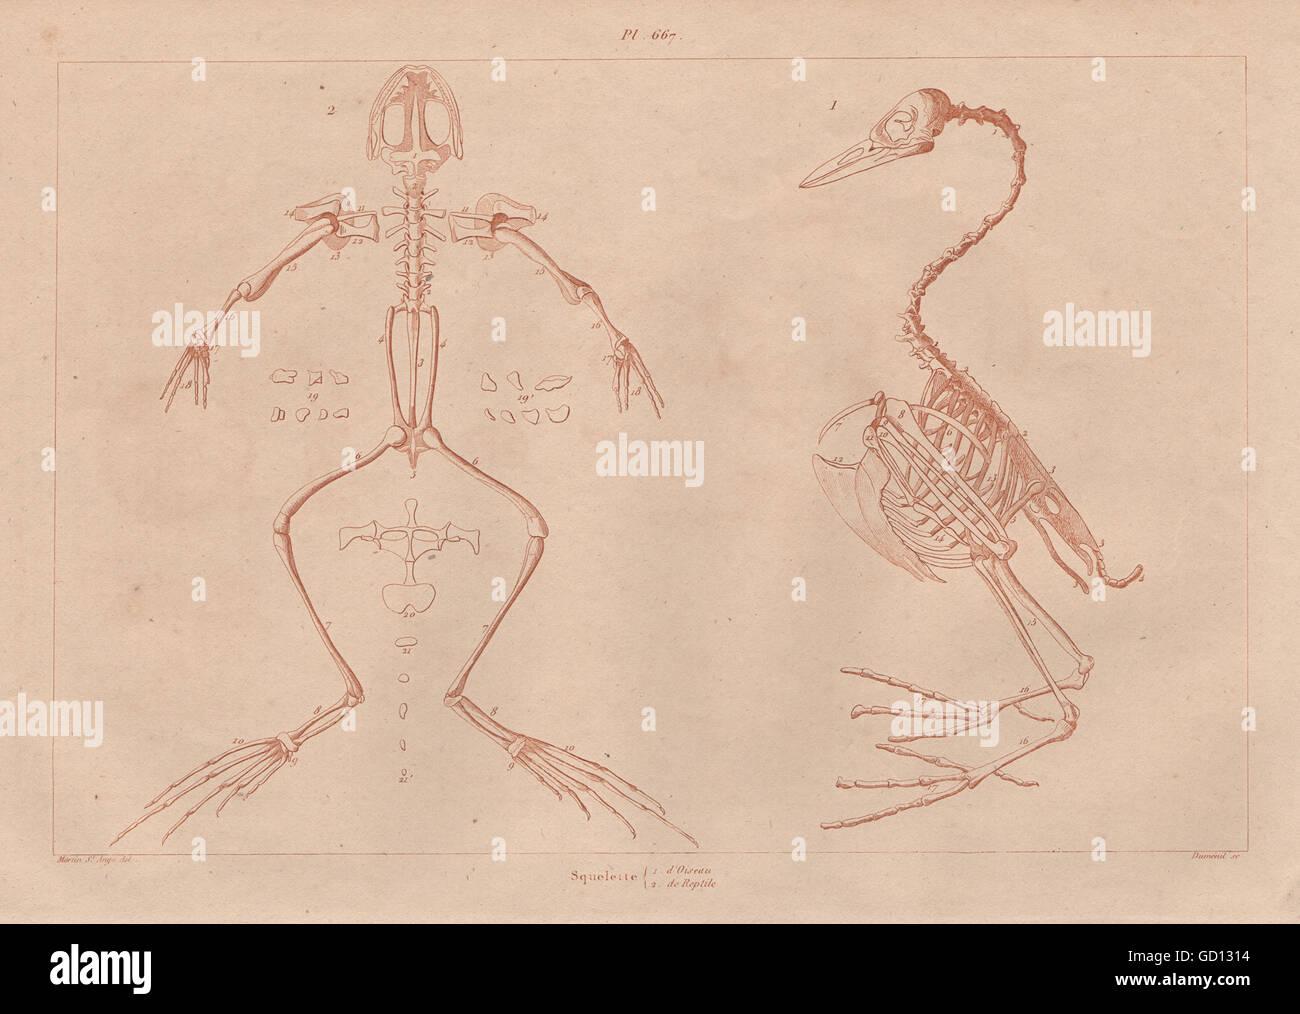 Anatomía: Squelette Oiseau & reptil. Aves y reptiles antiguos ...